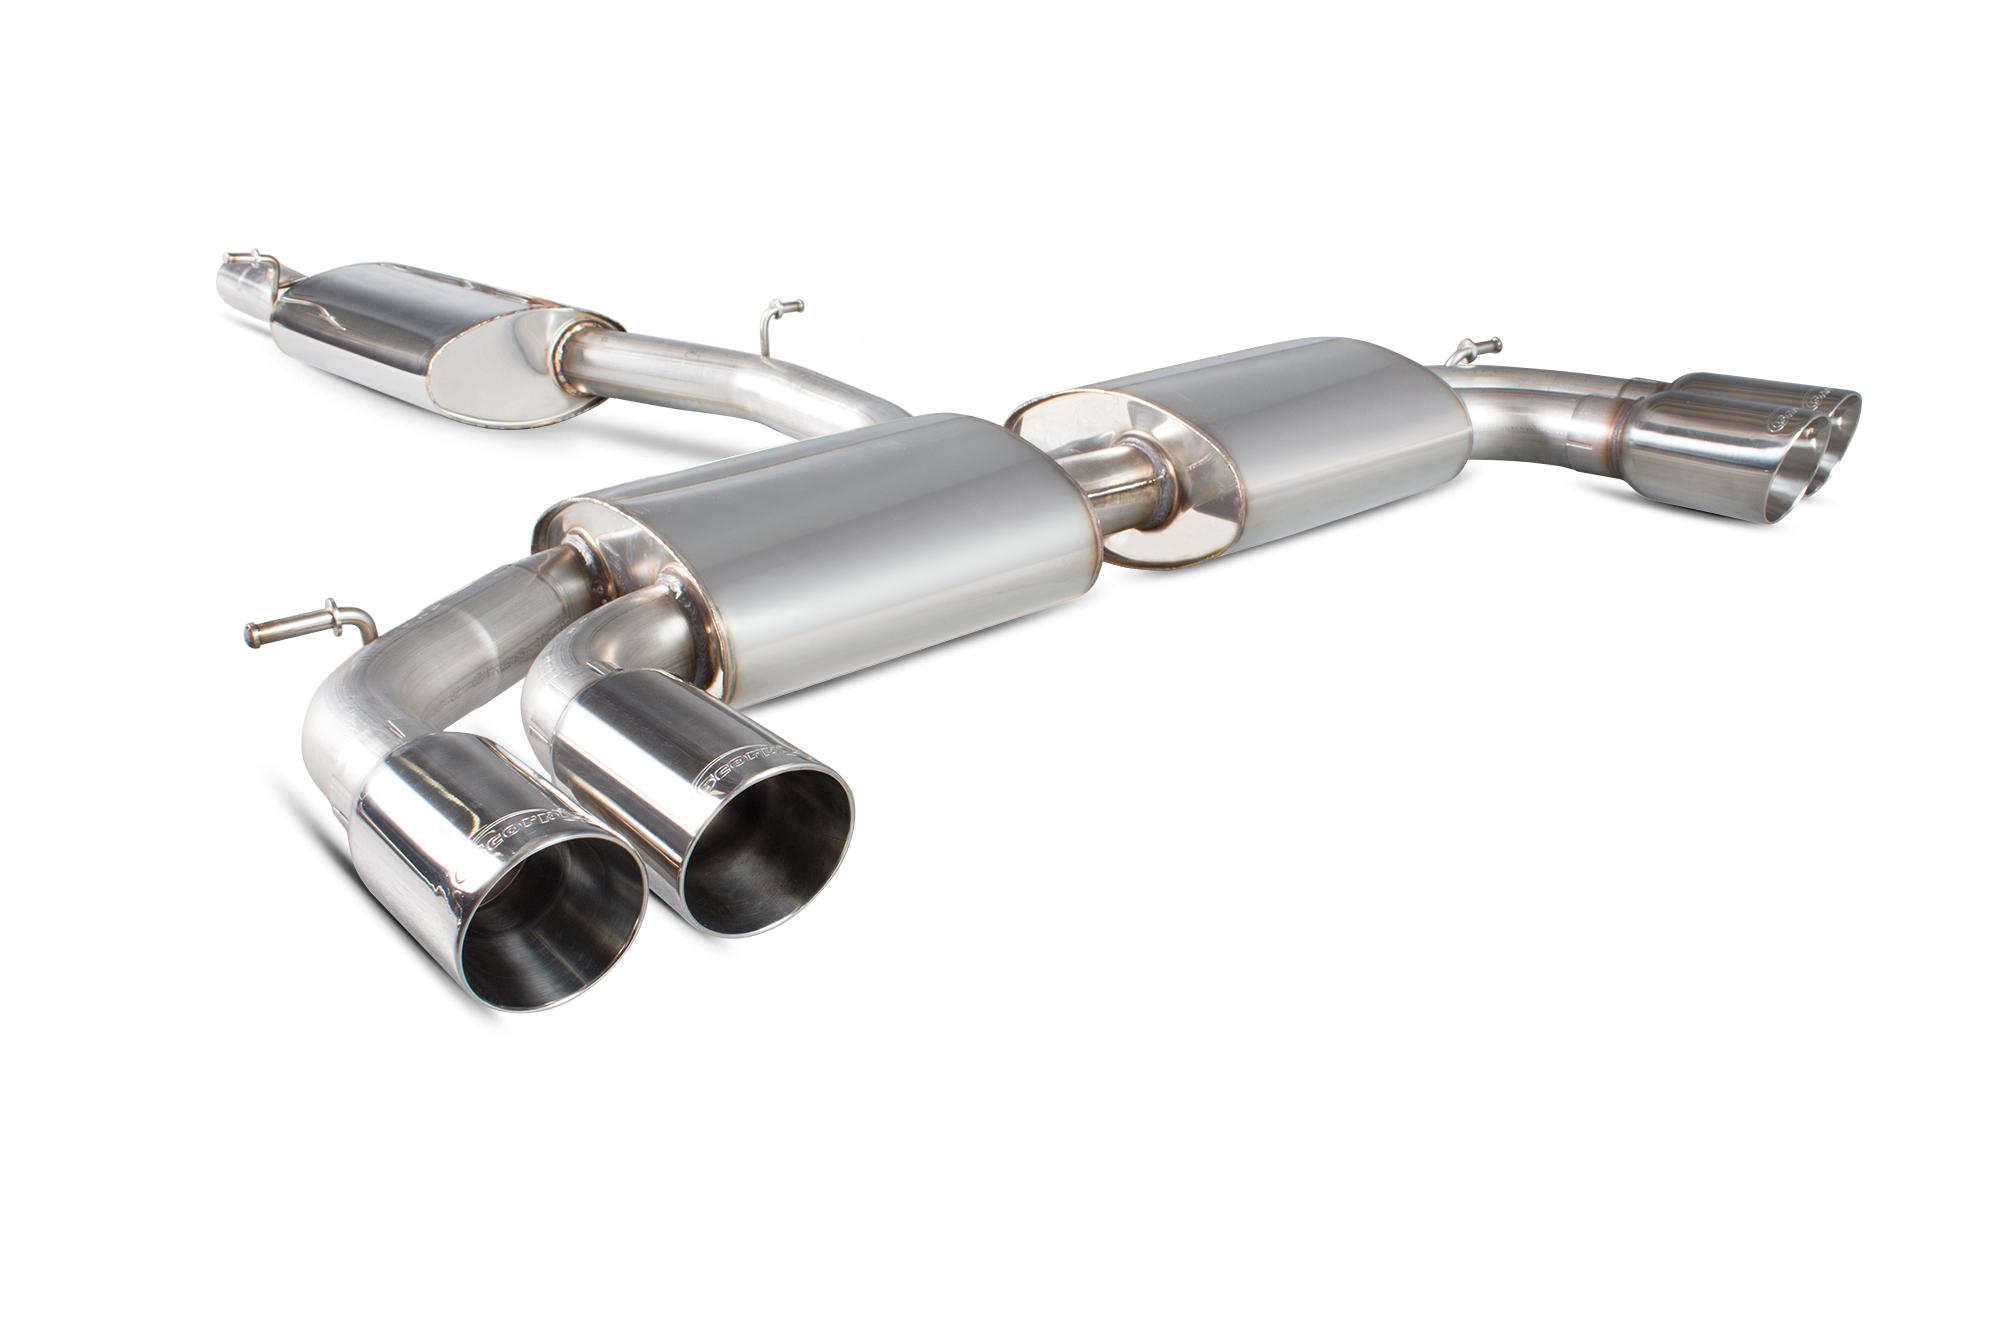 Scorpion Resonated GPF-back system with no valves Audi SQ2 SAU091